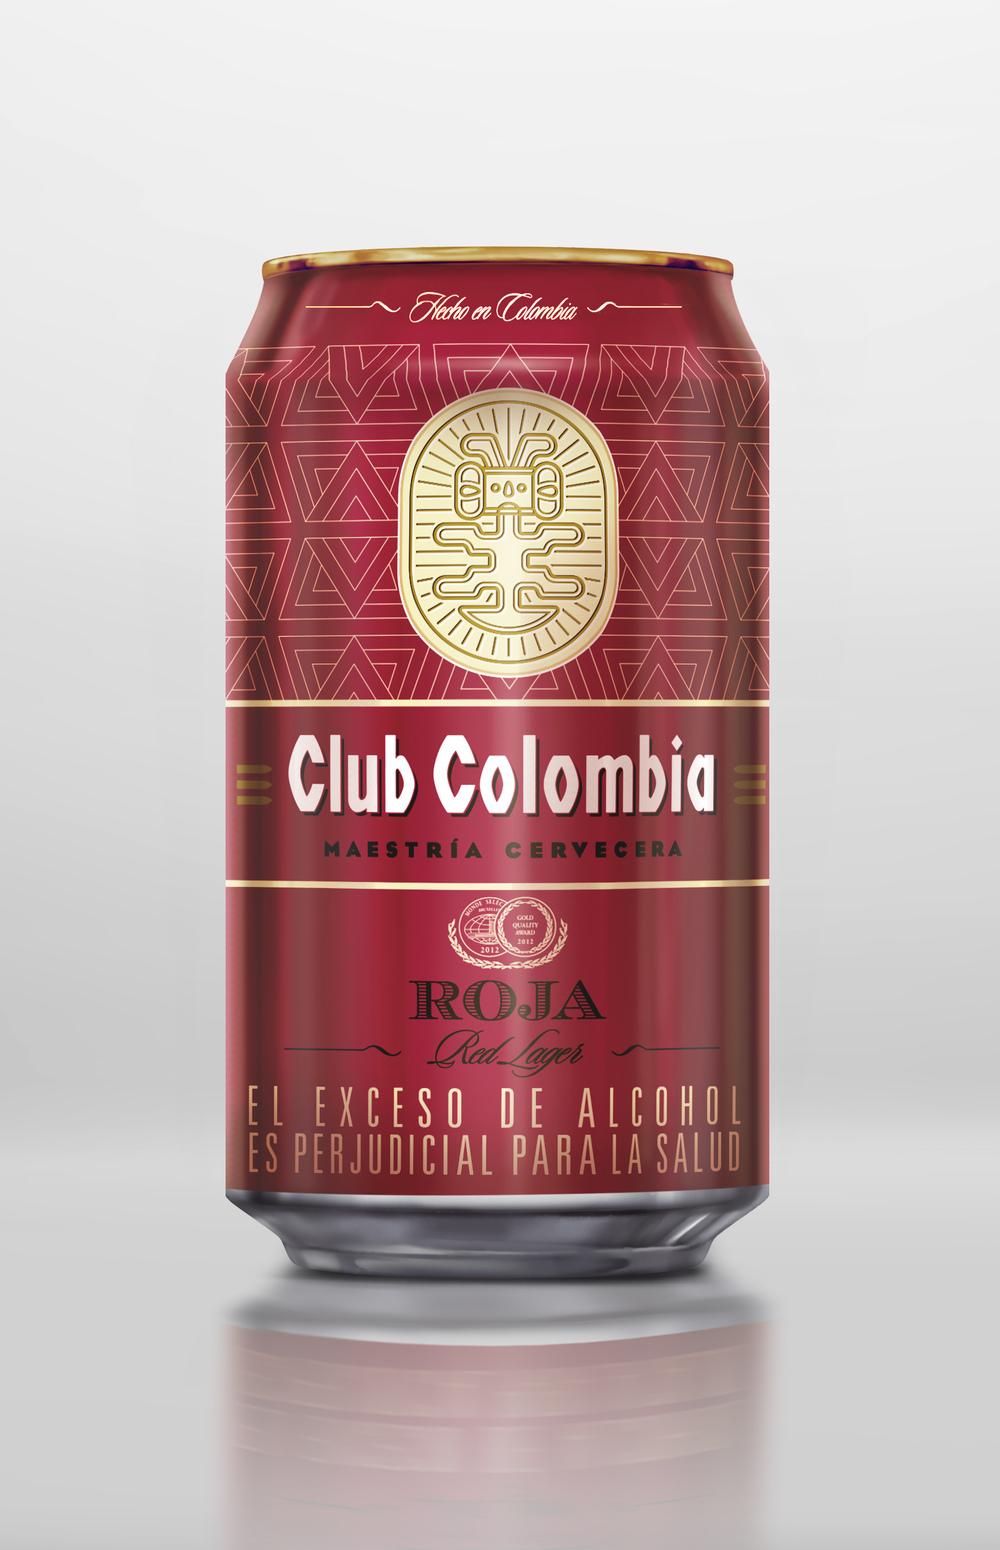 Agency: Leo Burnett   Client: Club Colombia   Illustration: Gold Lion Studio